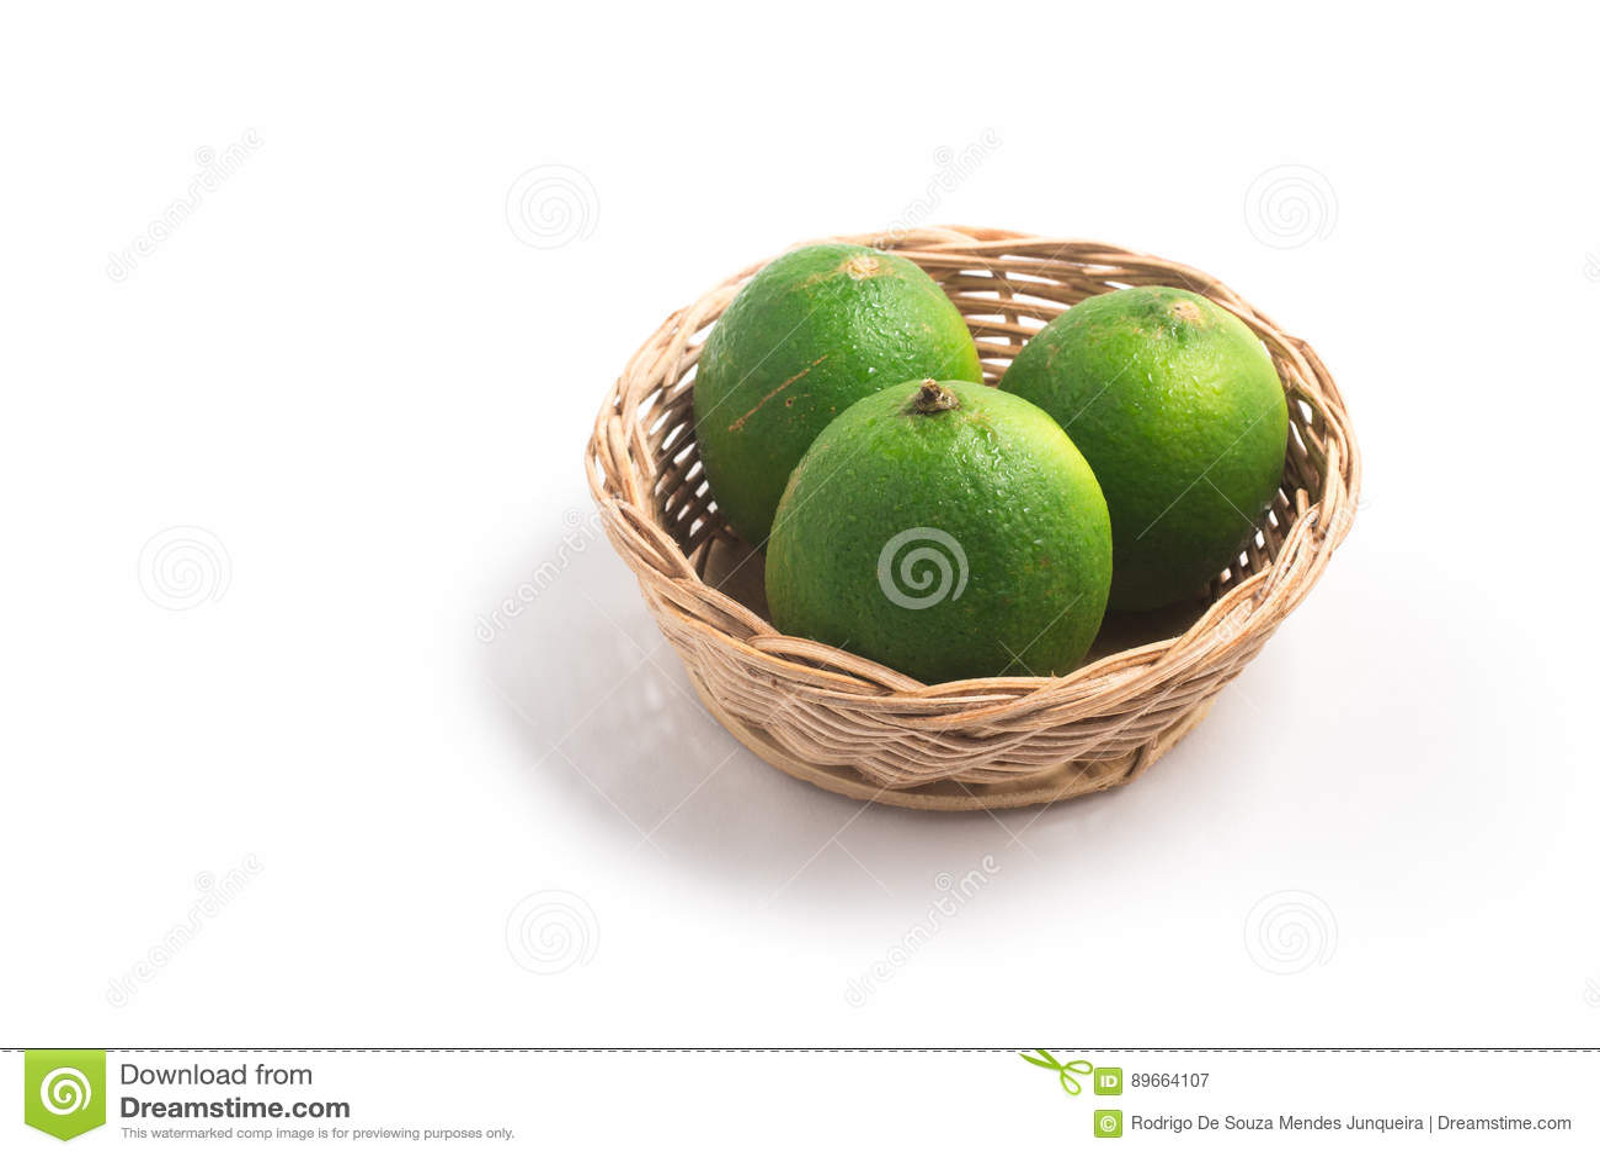 Fruits basket lemon threesome where